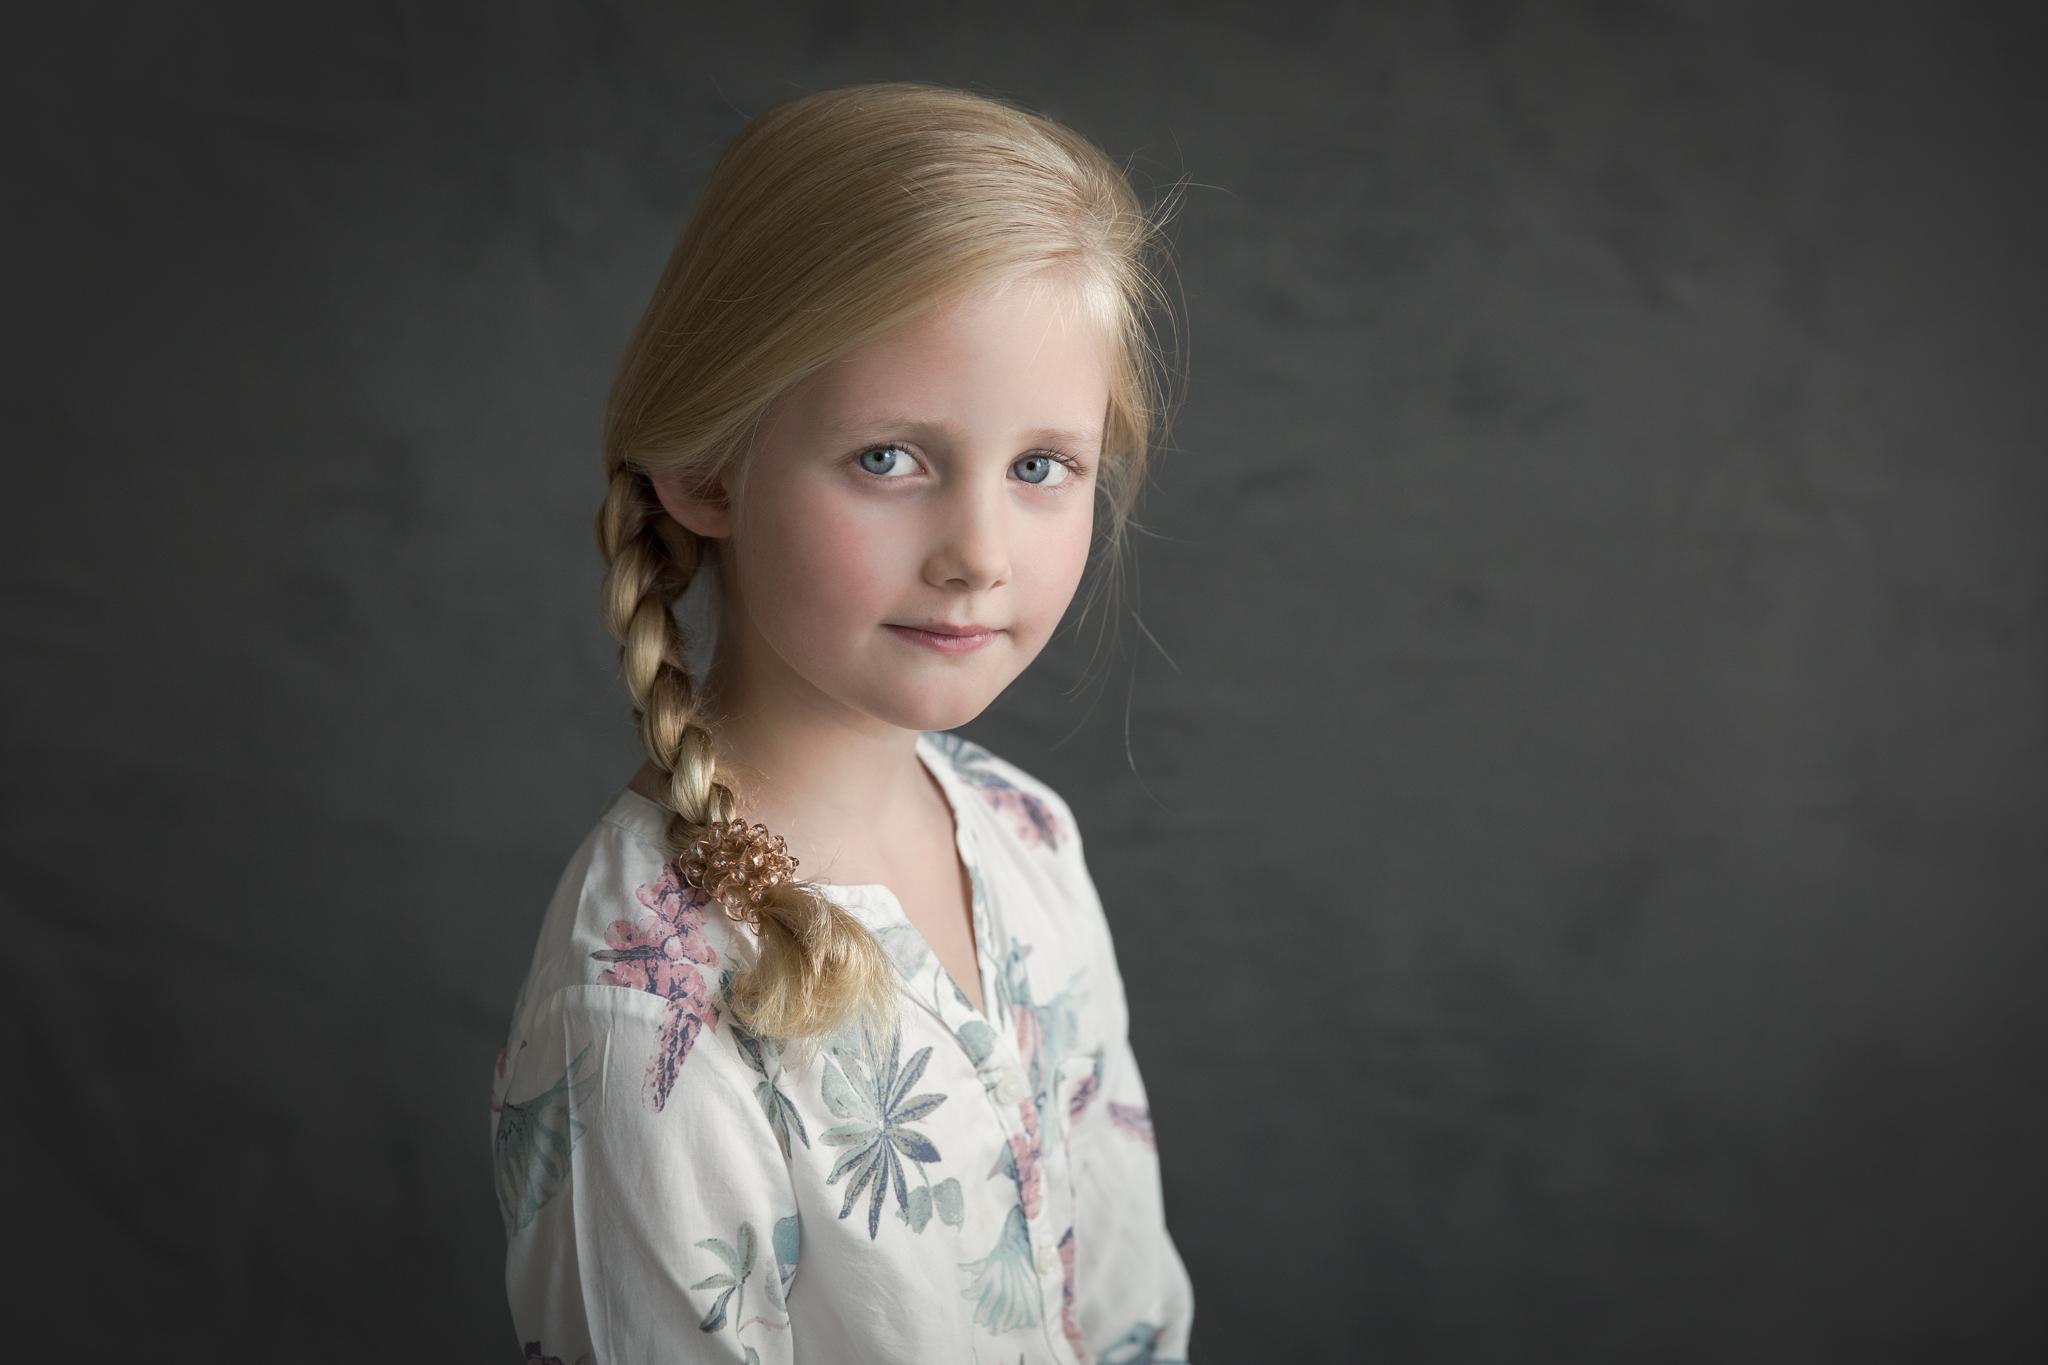 kinderfotografie-ellenmetz